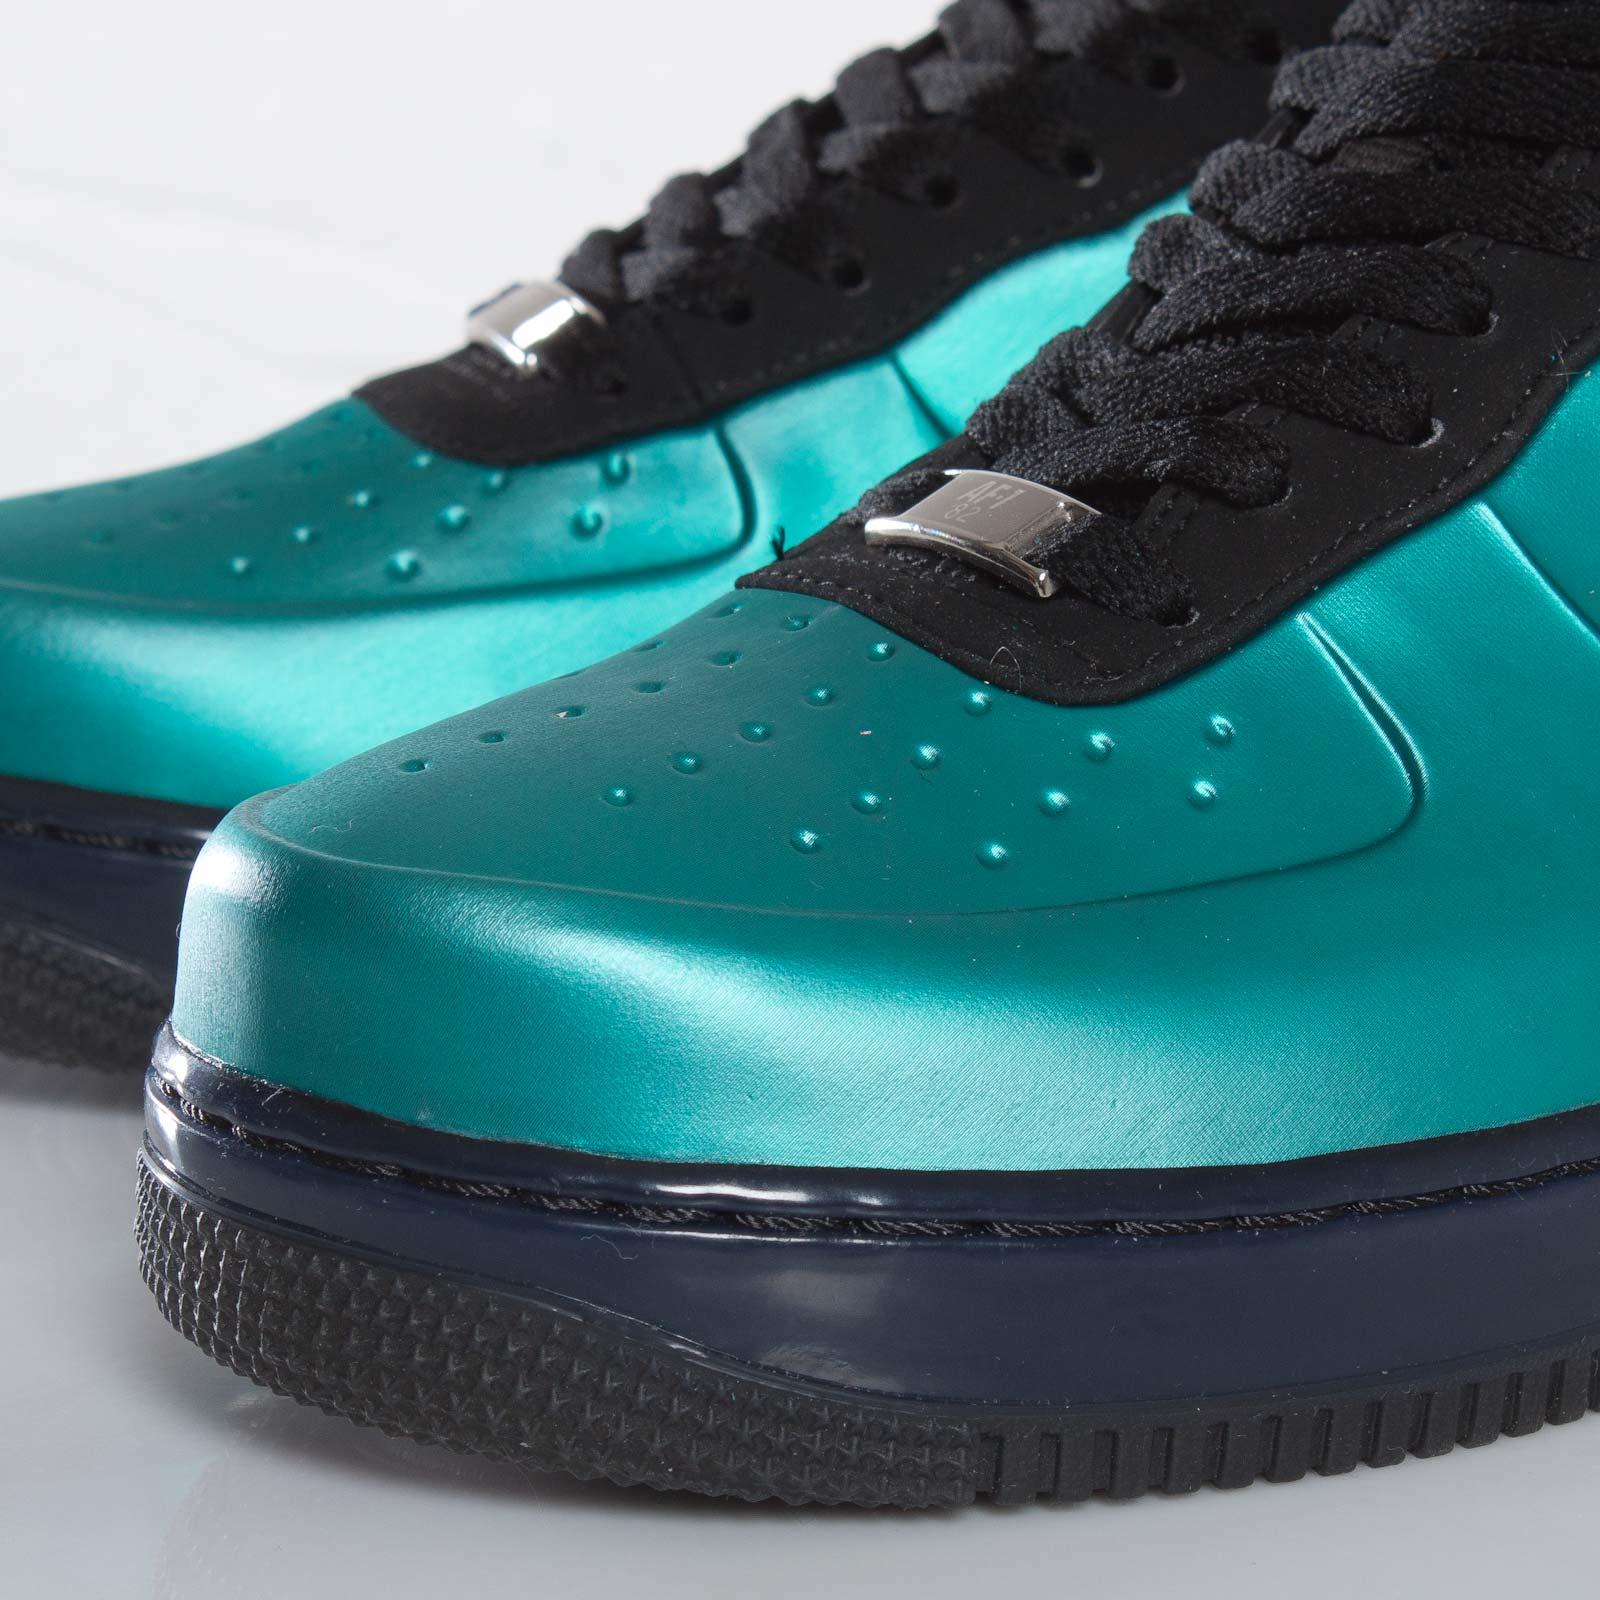 71eee374ad Nike Air Force 1 Foamposite Pro Low - 532461-300 - Sneakersnstuff ...